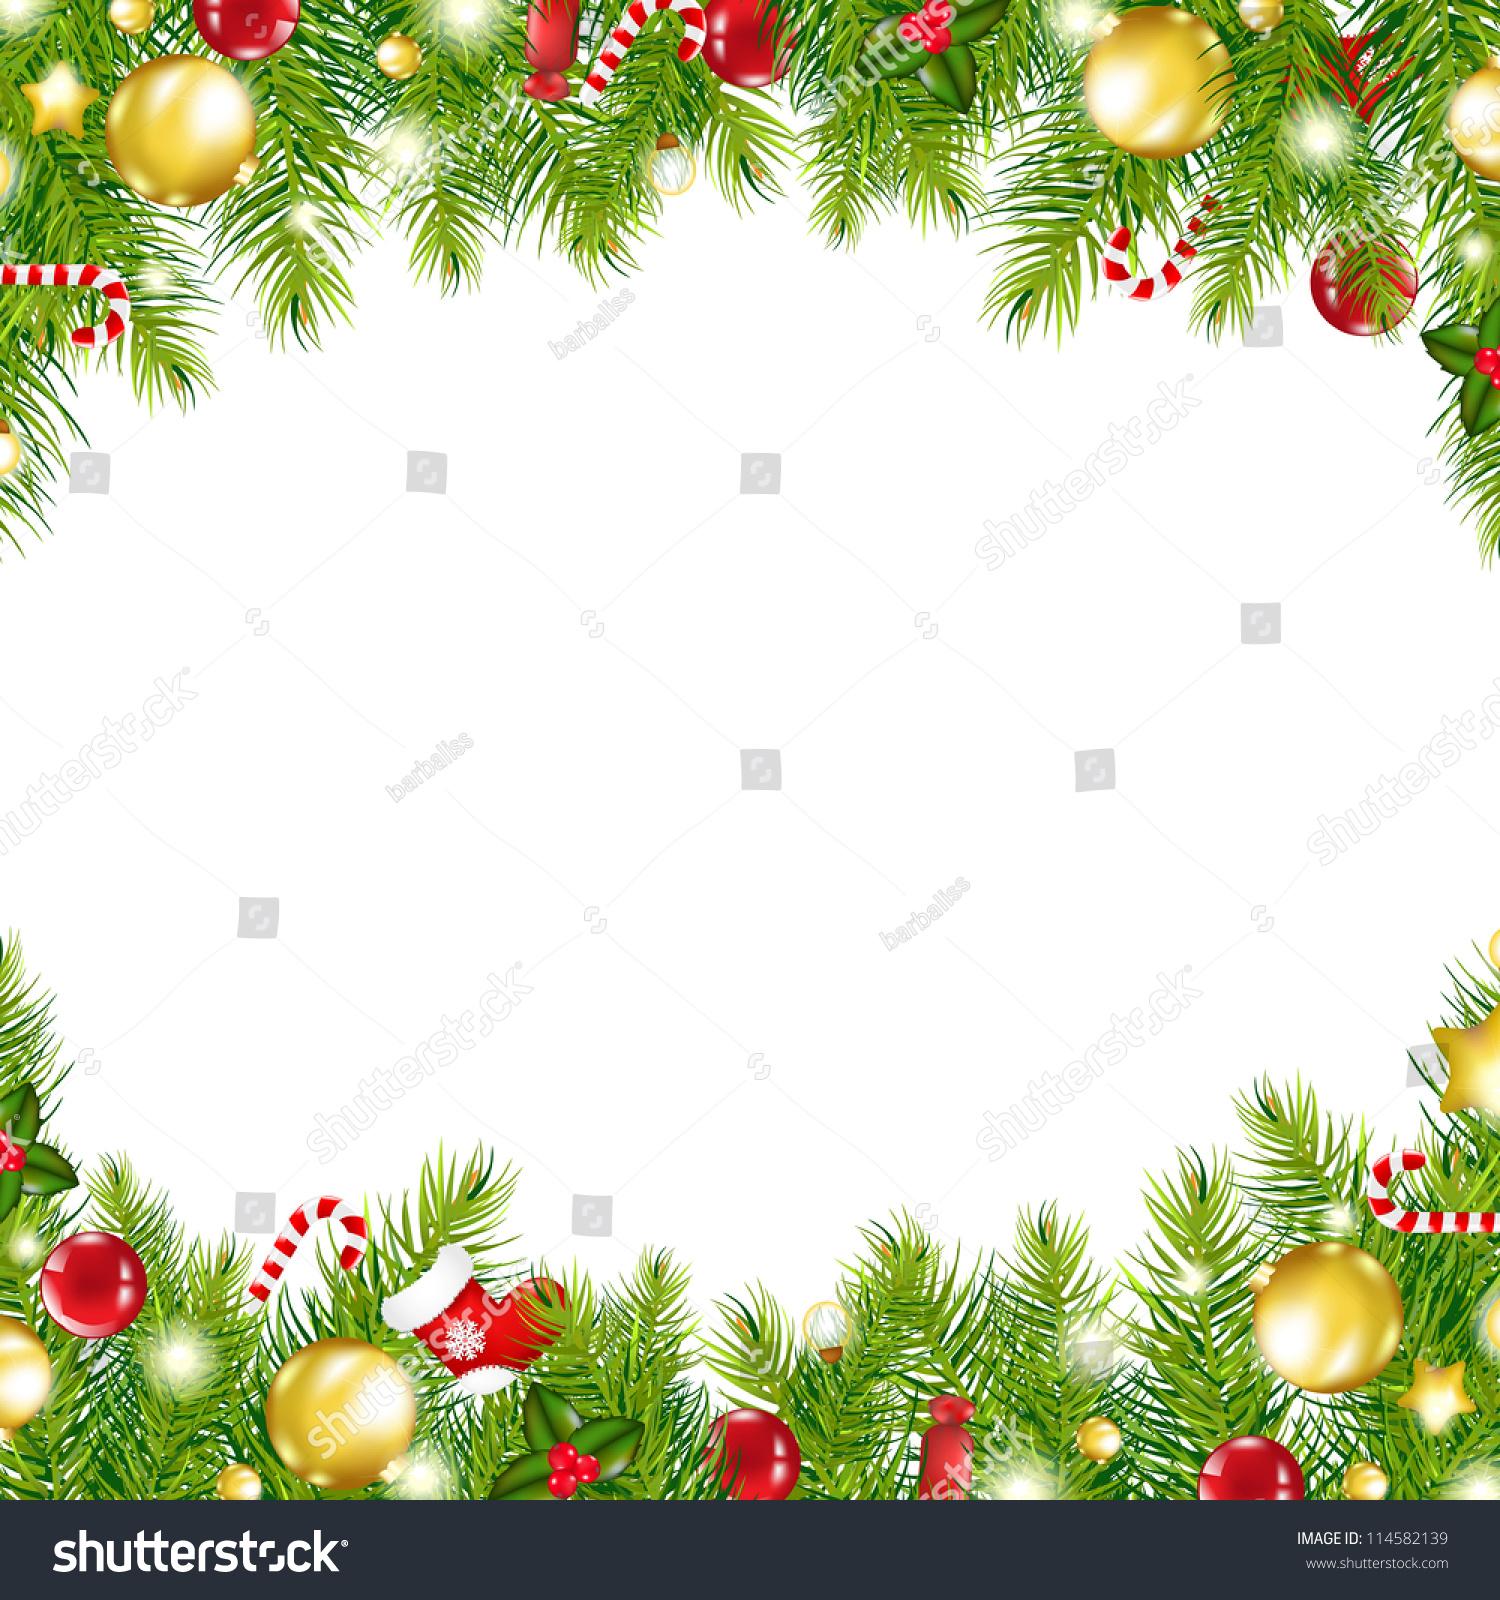 Christmas vintage border isolated on white stock